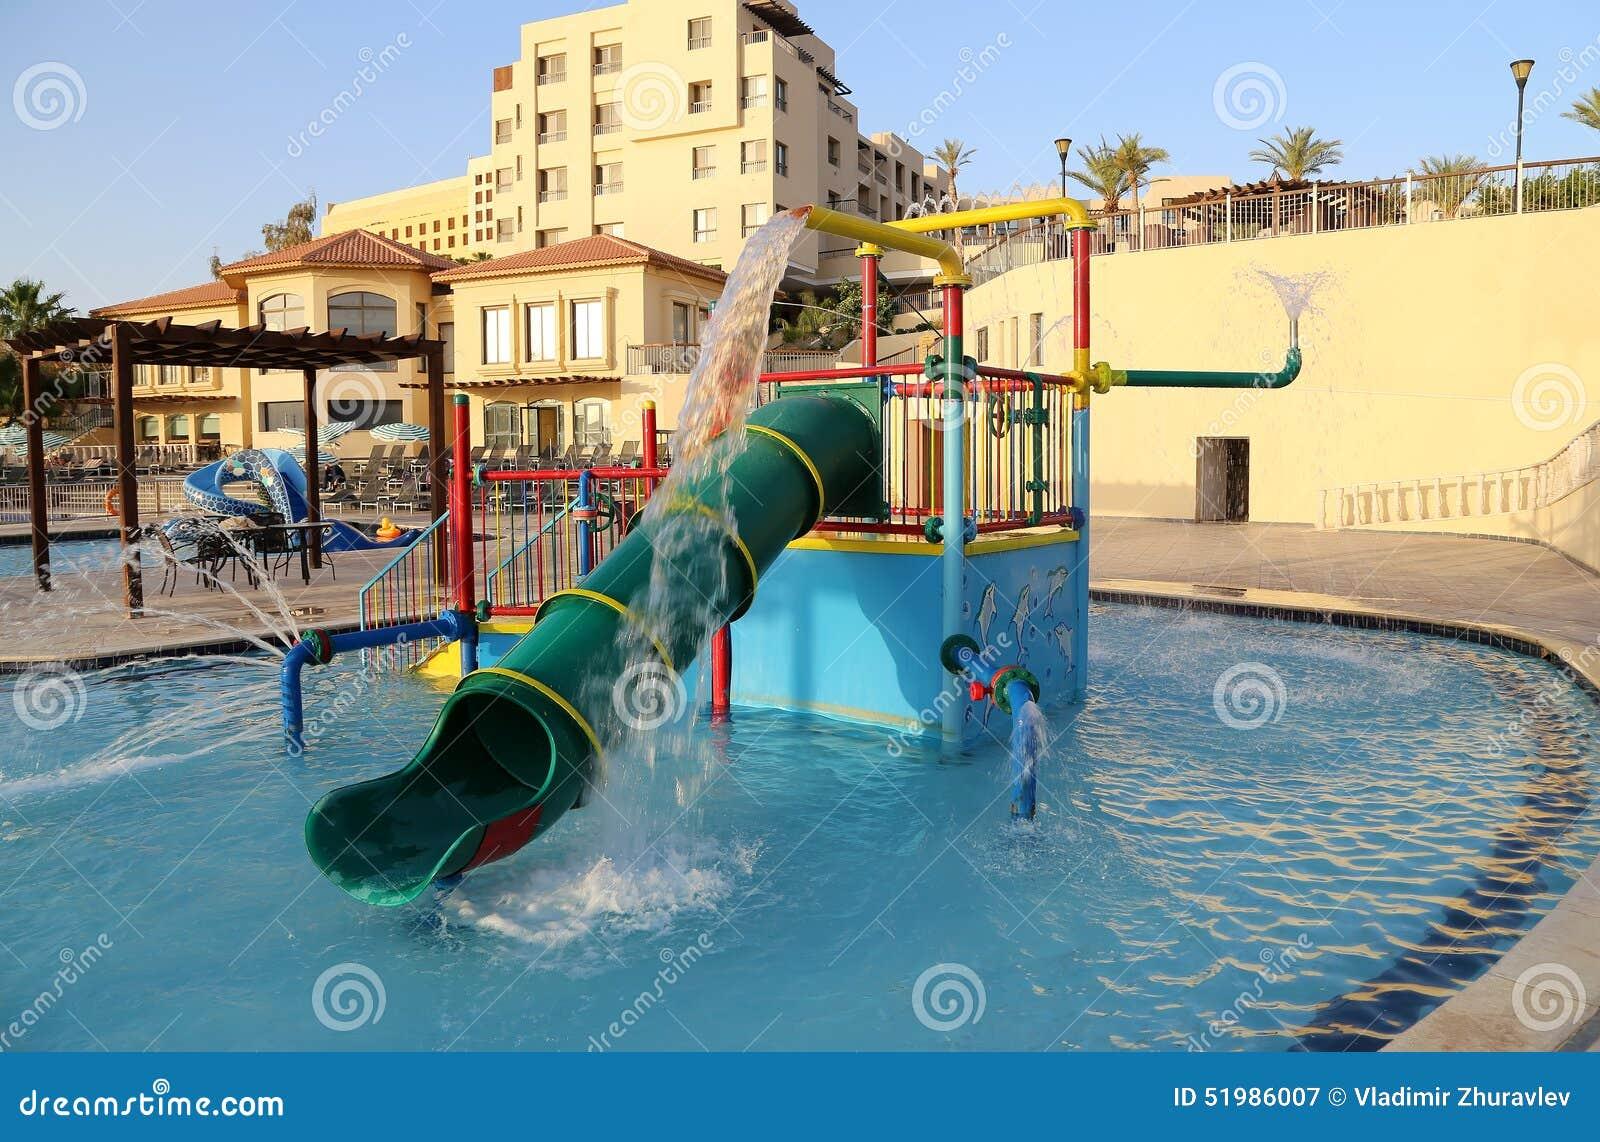 Children 39 S Swimming Pool With Slides For Entertainment Resort On The Dead Sea Jordan Stock